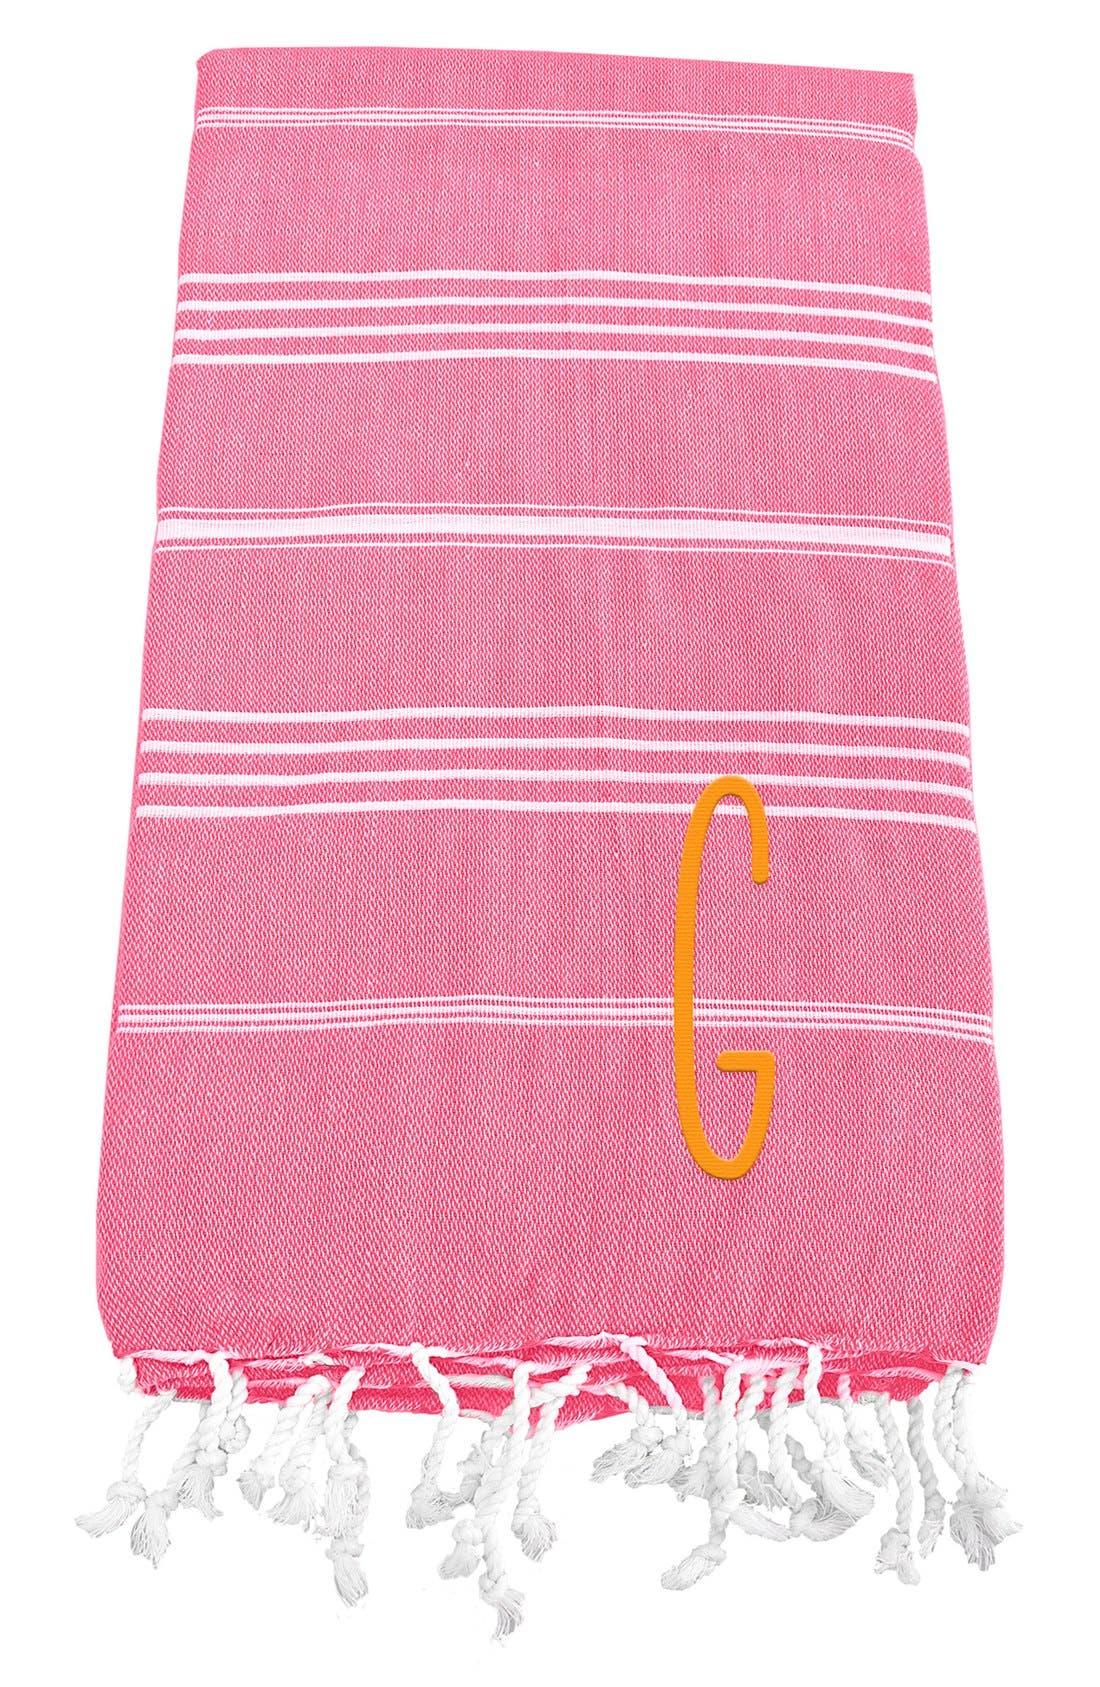 Monogram Turkish Cotton Towel,                             Main thumbnail 143, color,